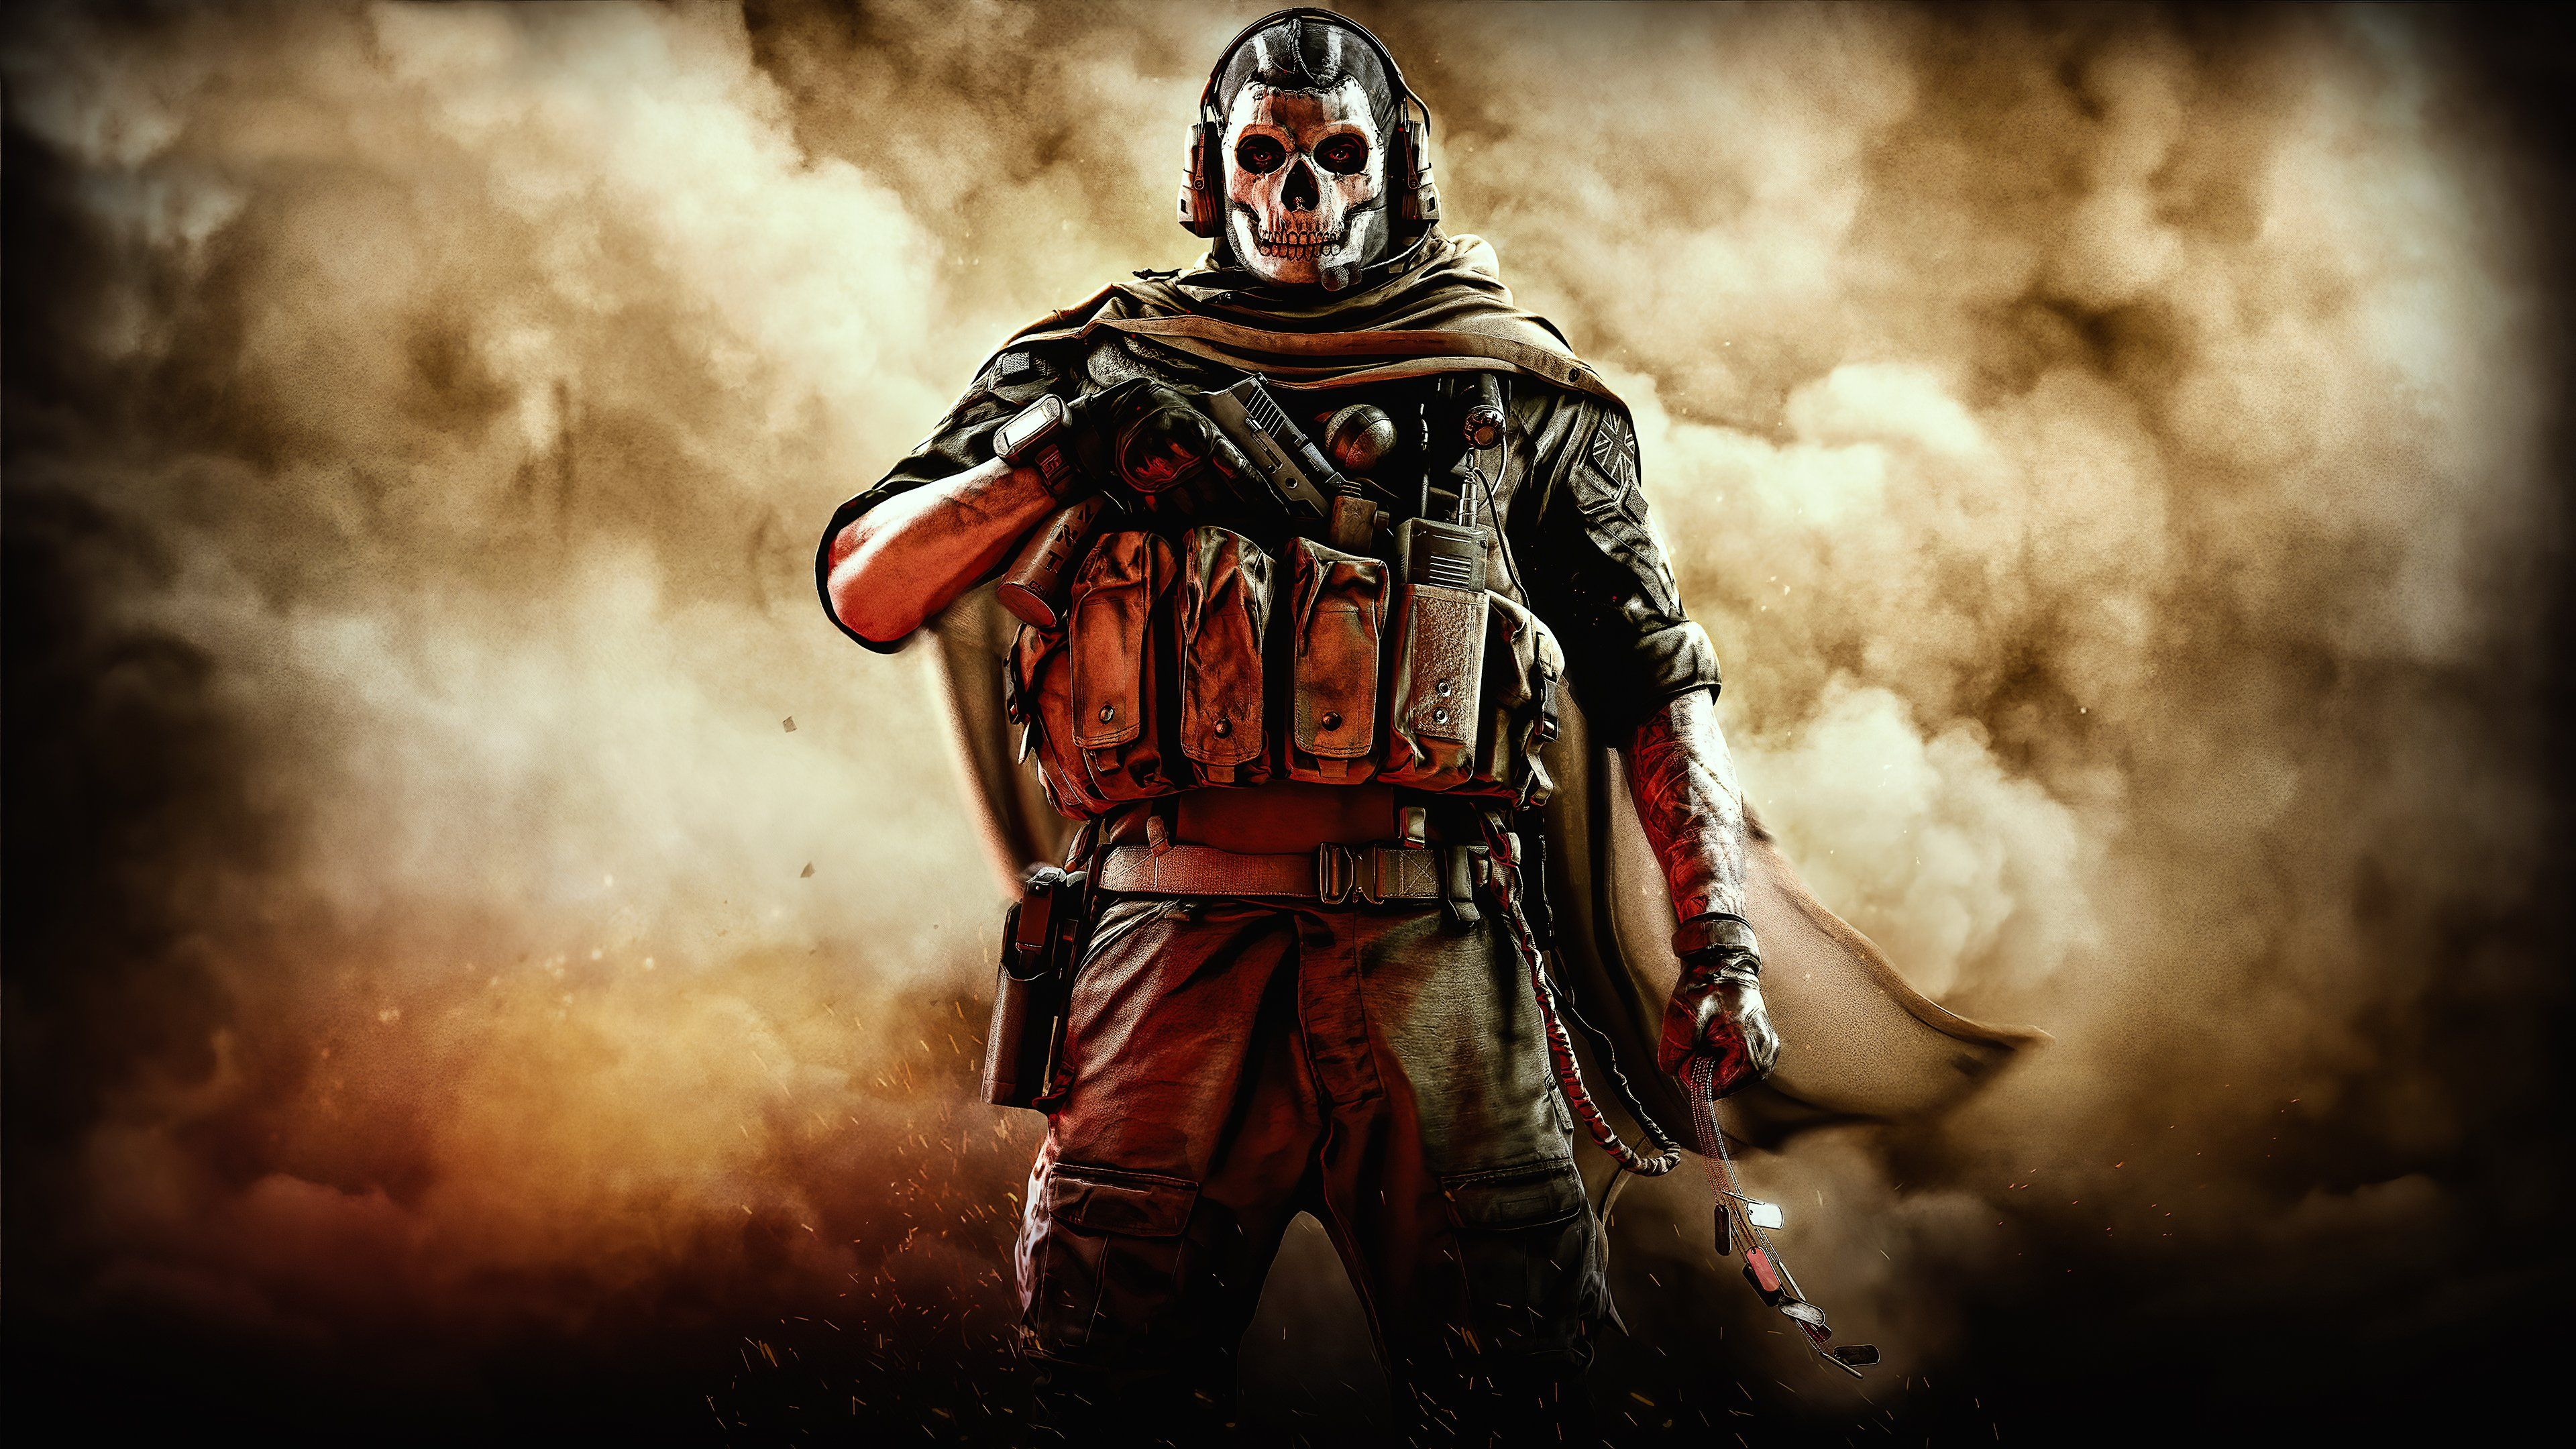 Call Of Duty Modern Warfare 2020 Warzone Ghost 4k Wallpaper Syanart Station In 2020 Call Of Duty Modern Warfare Ghost Soldiers